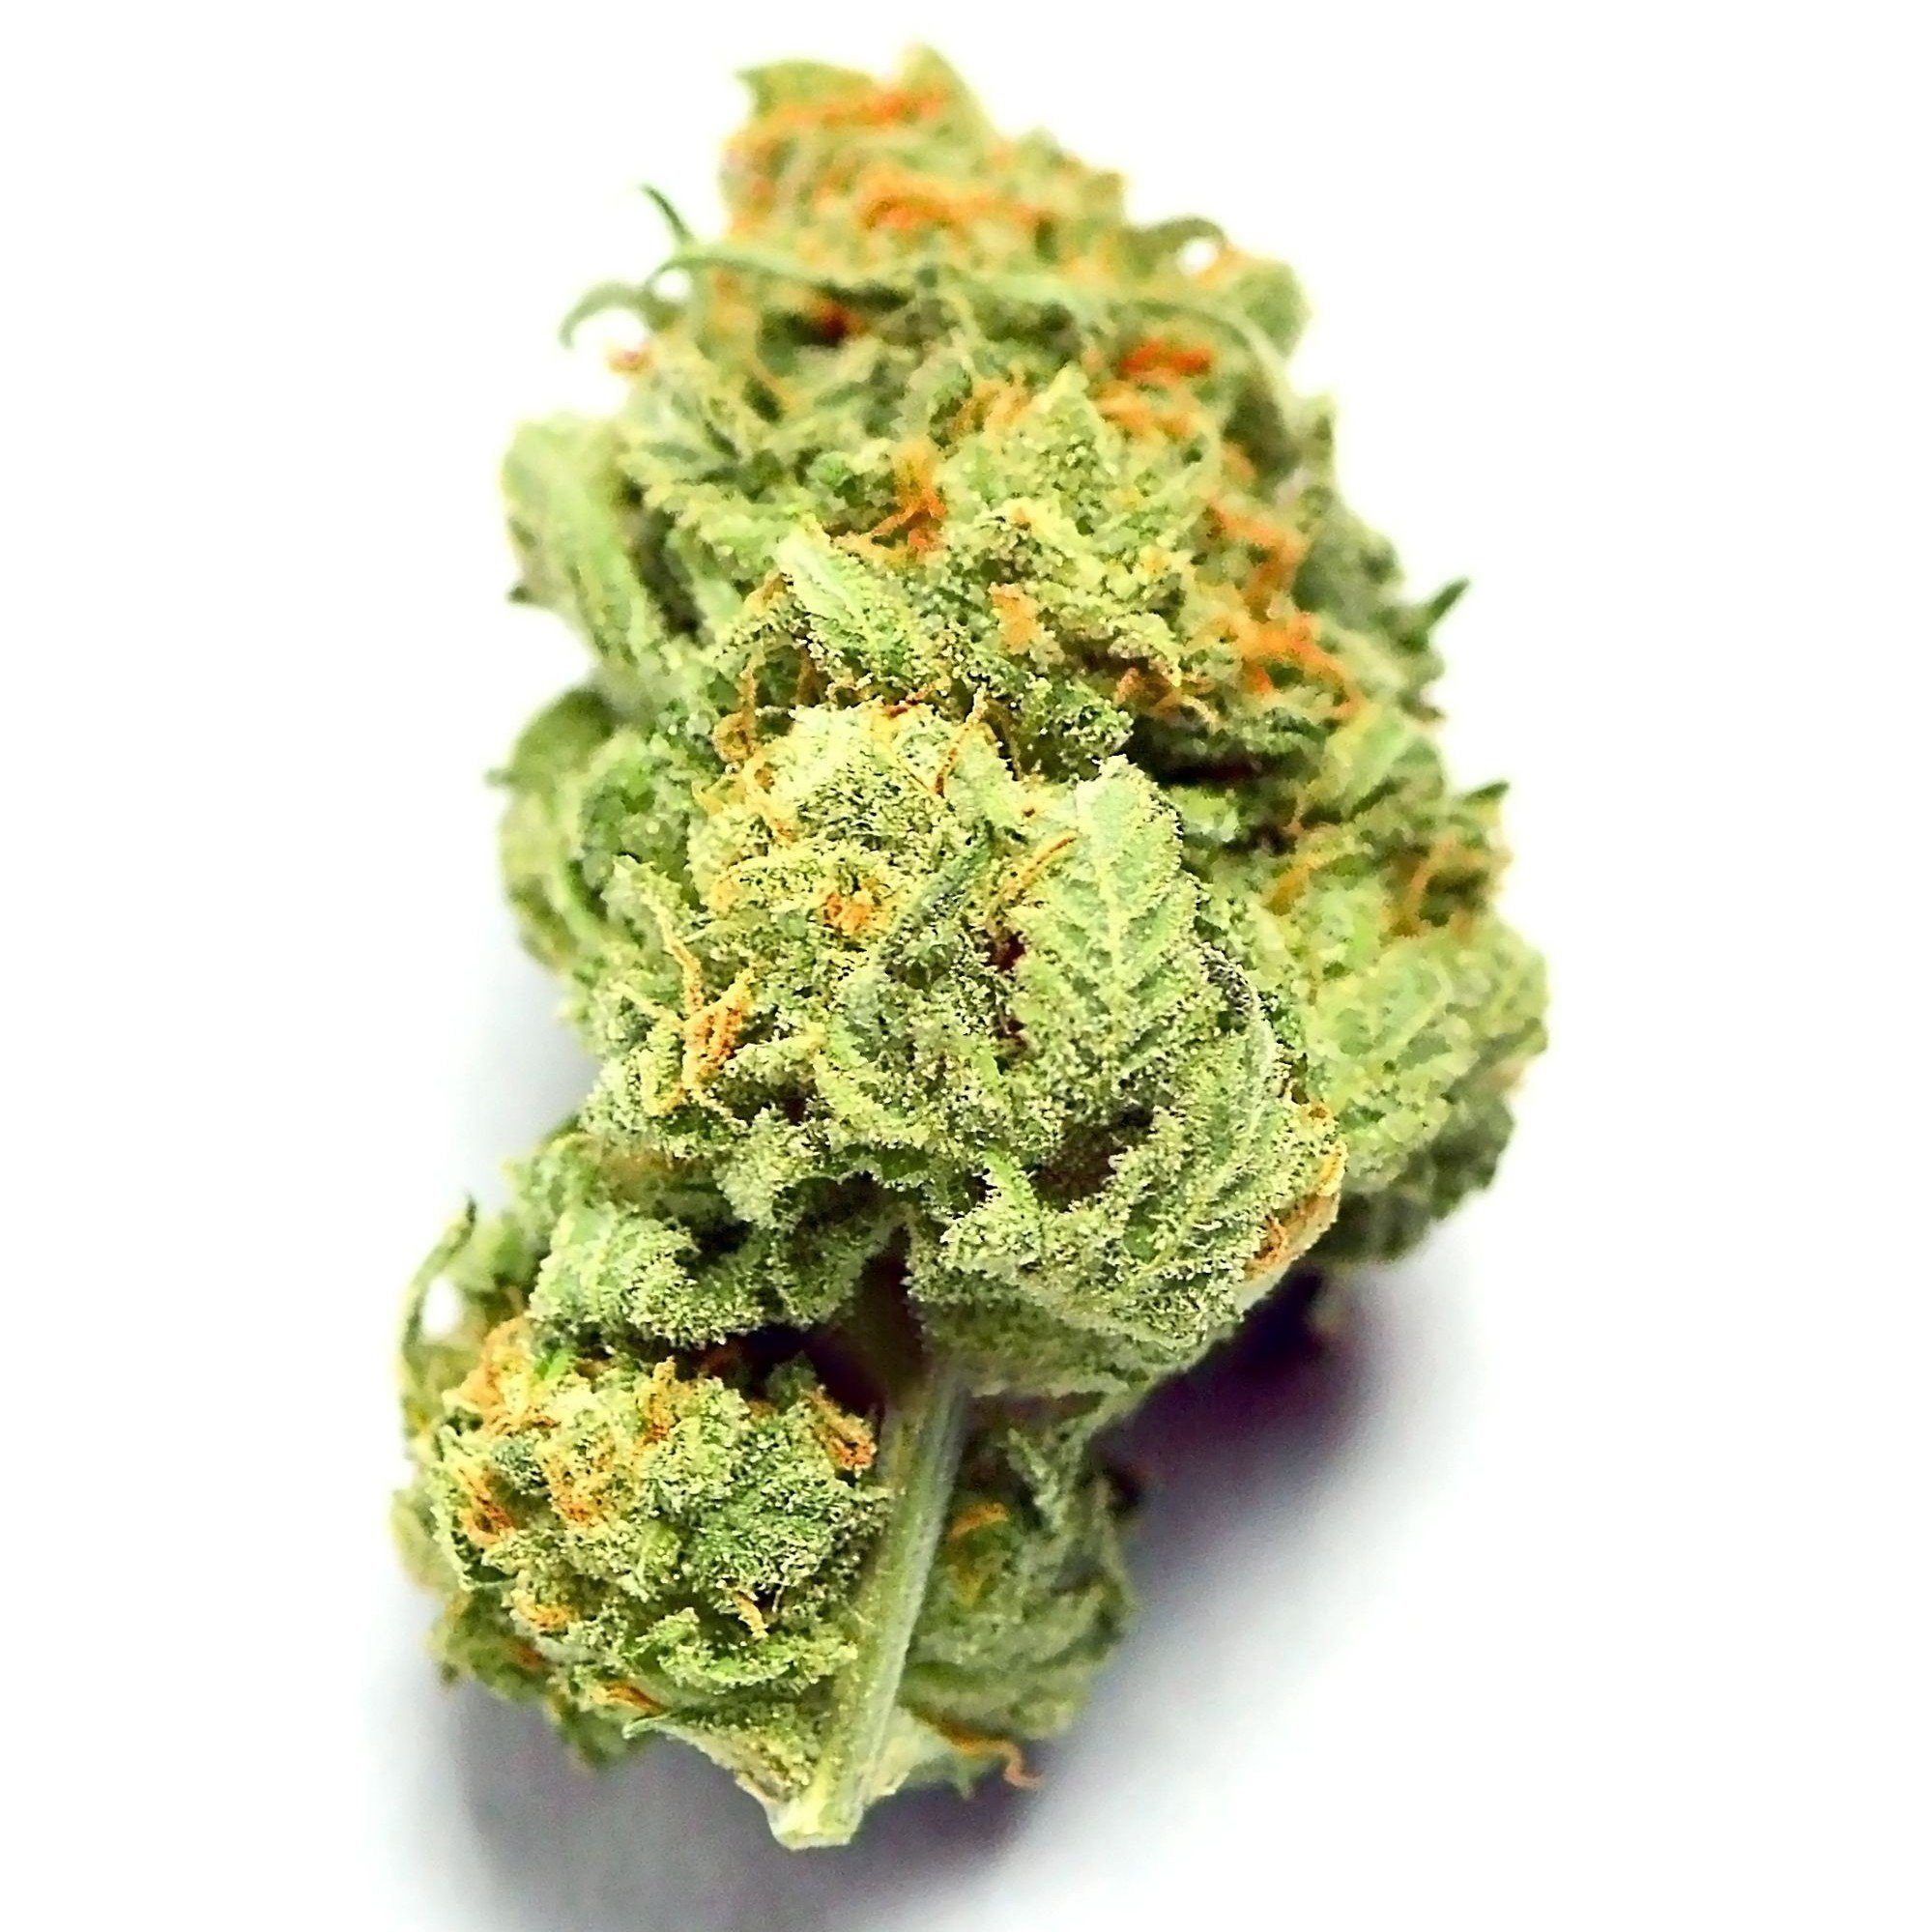 buy kush weed online